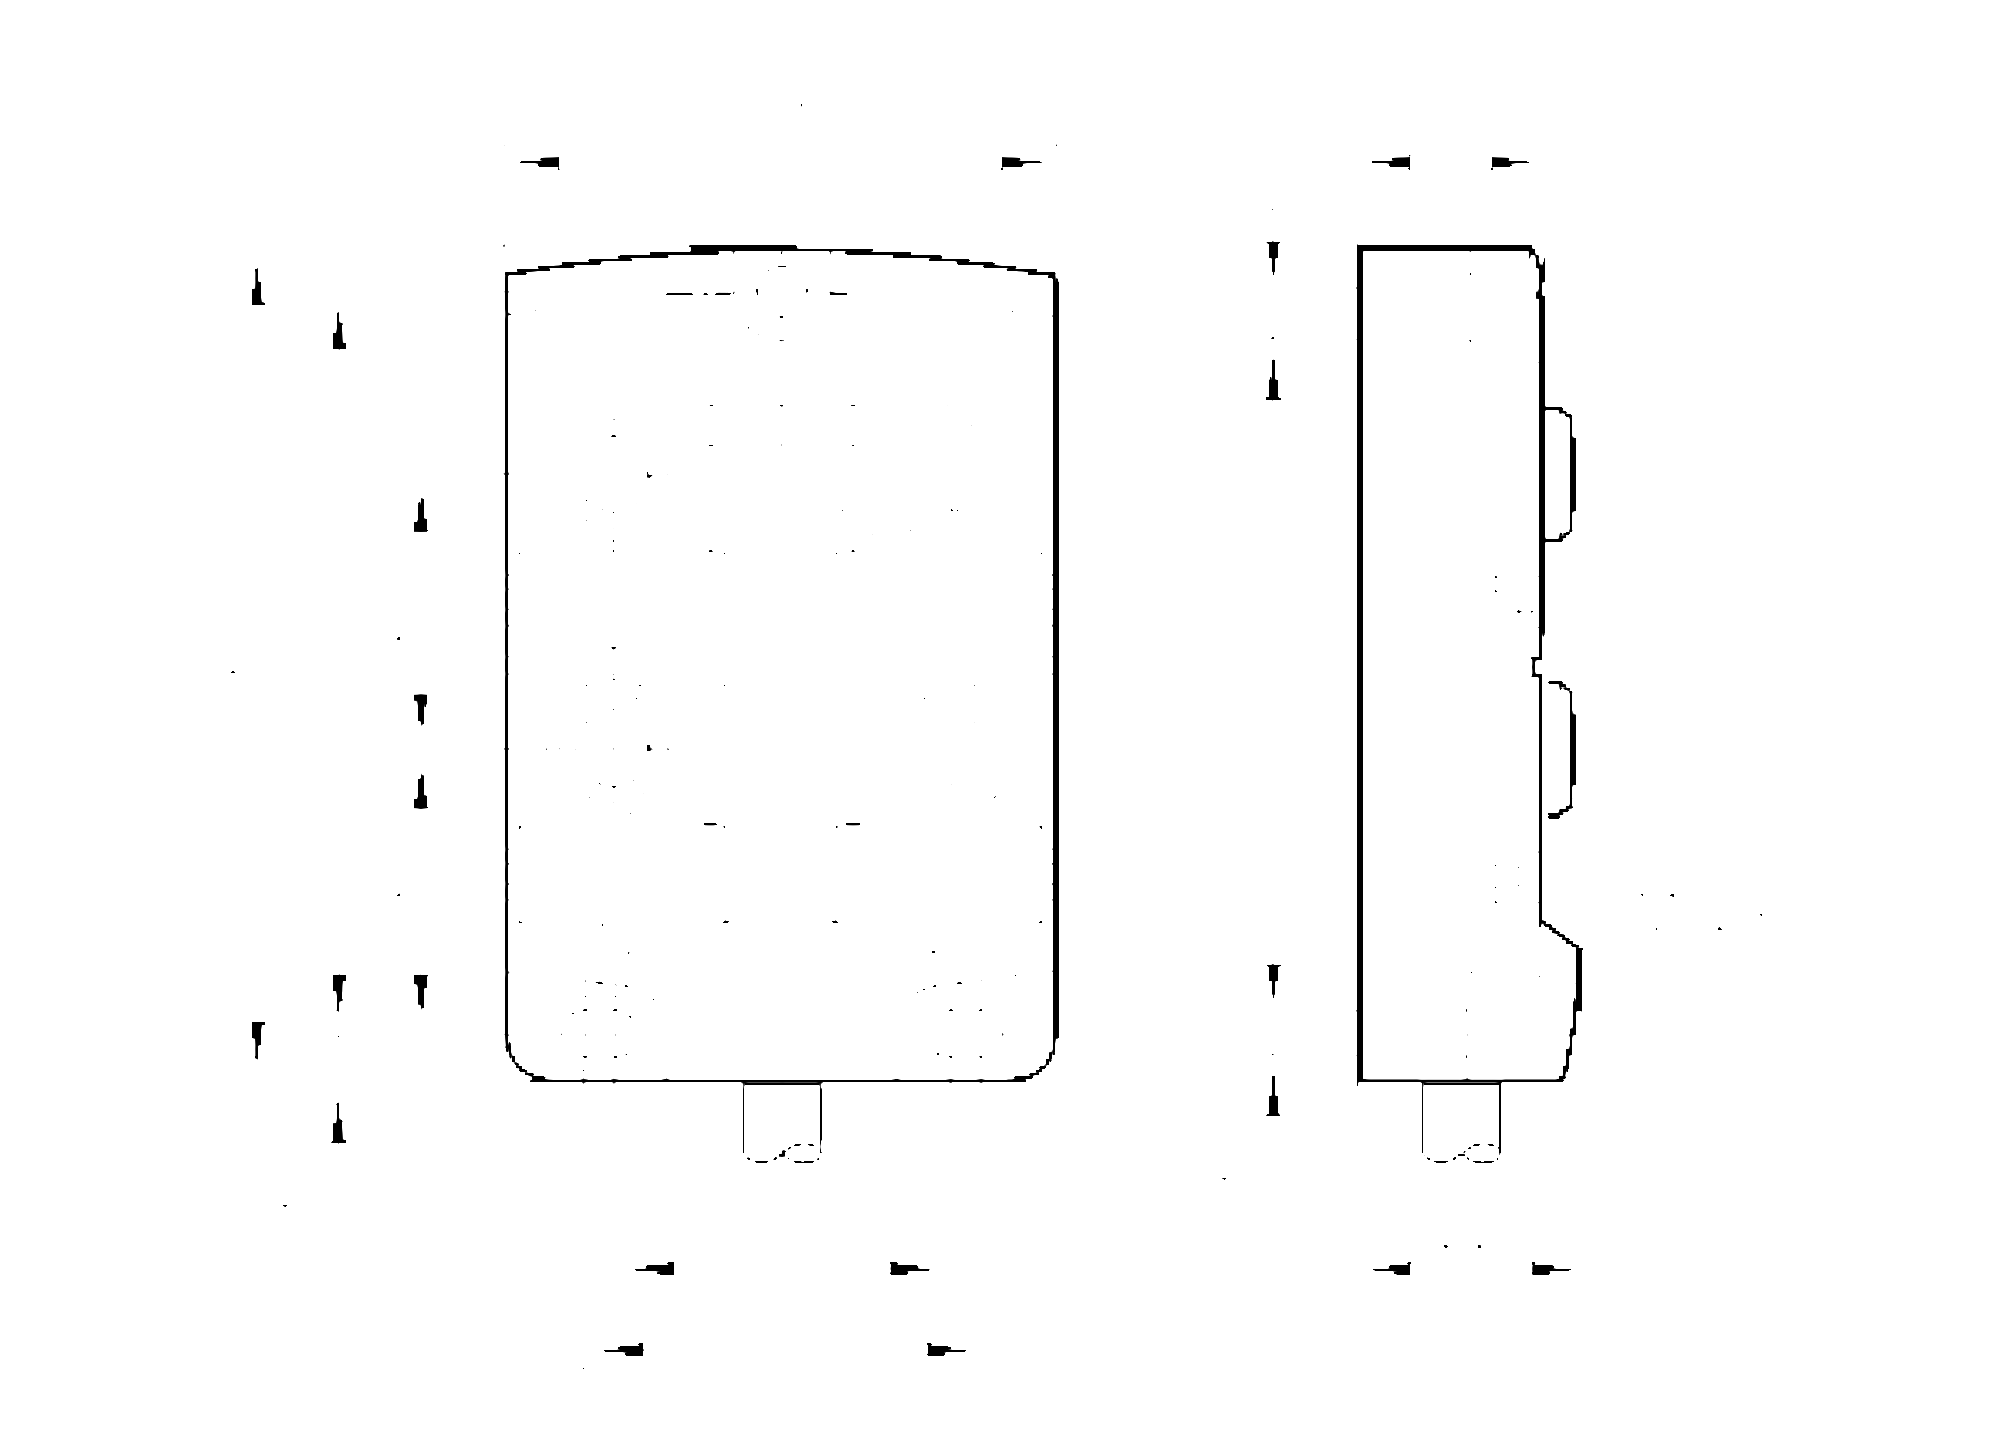 ebc016 - wiring block